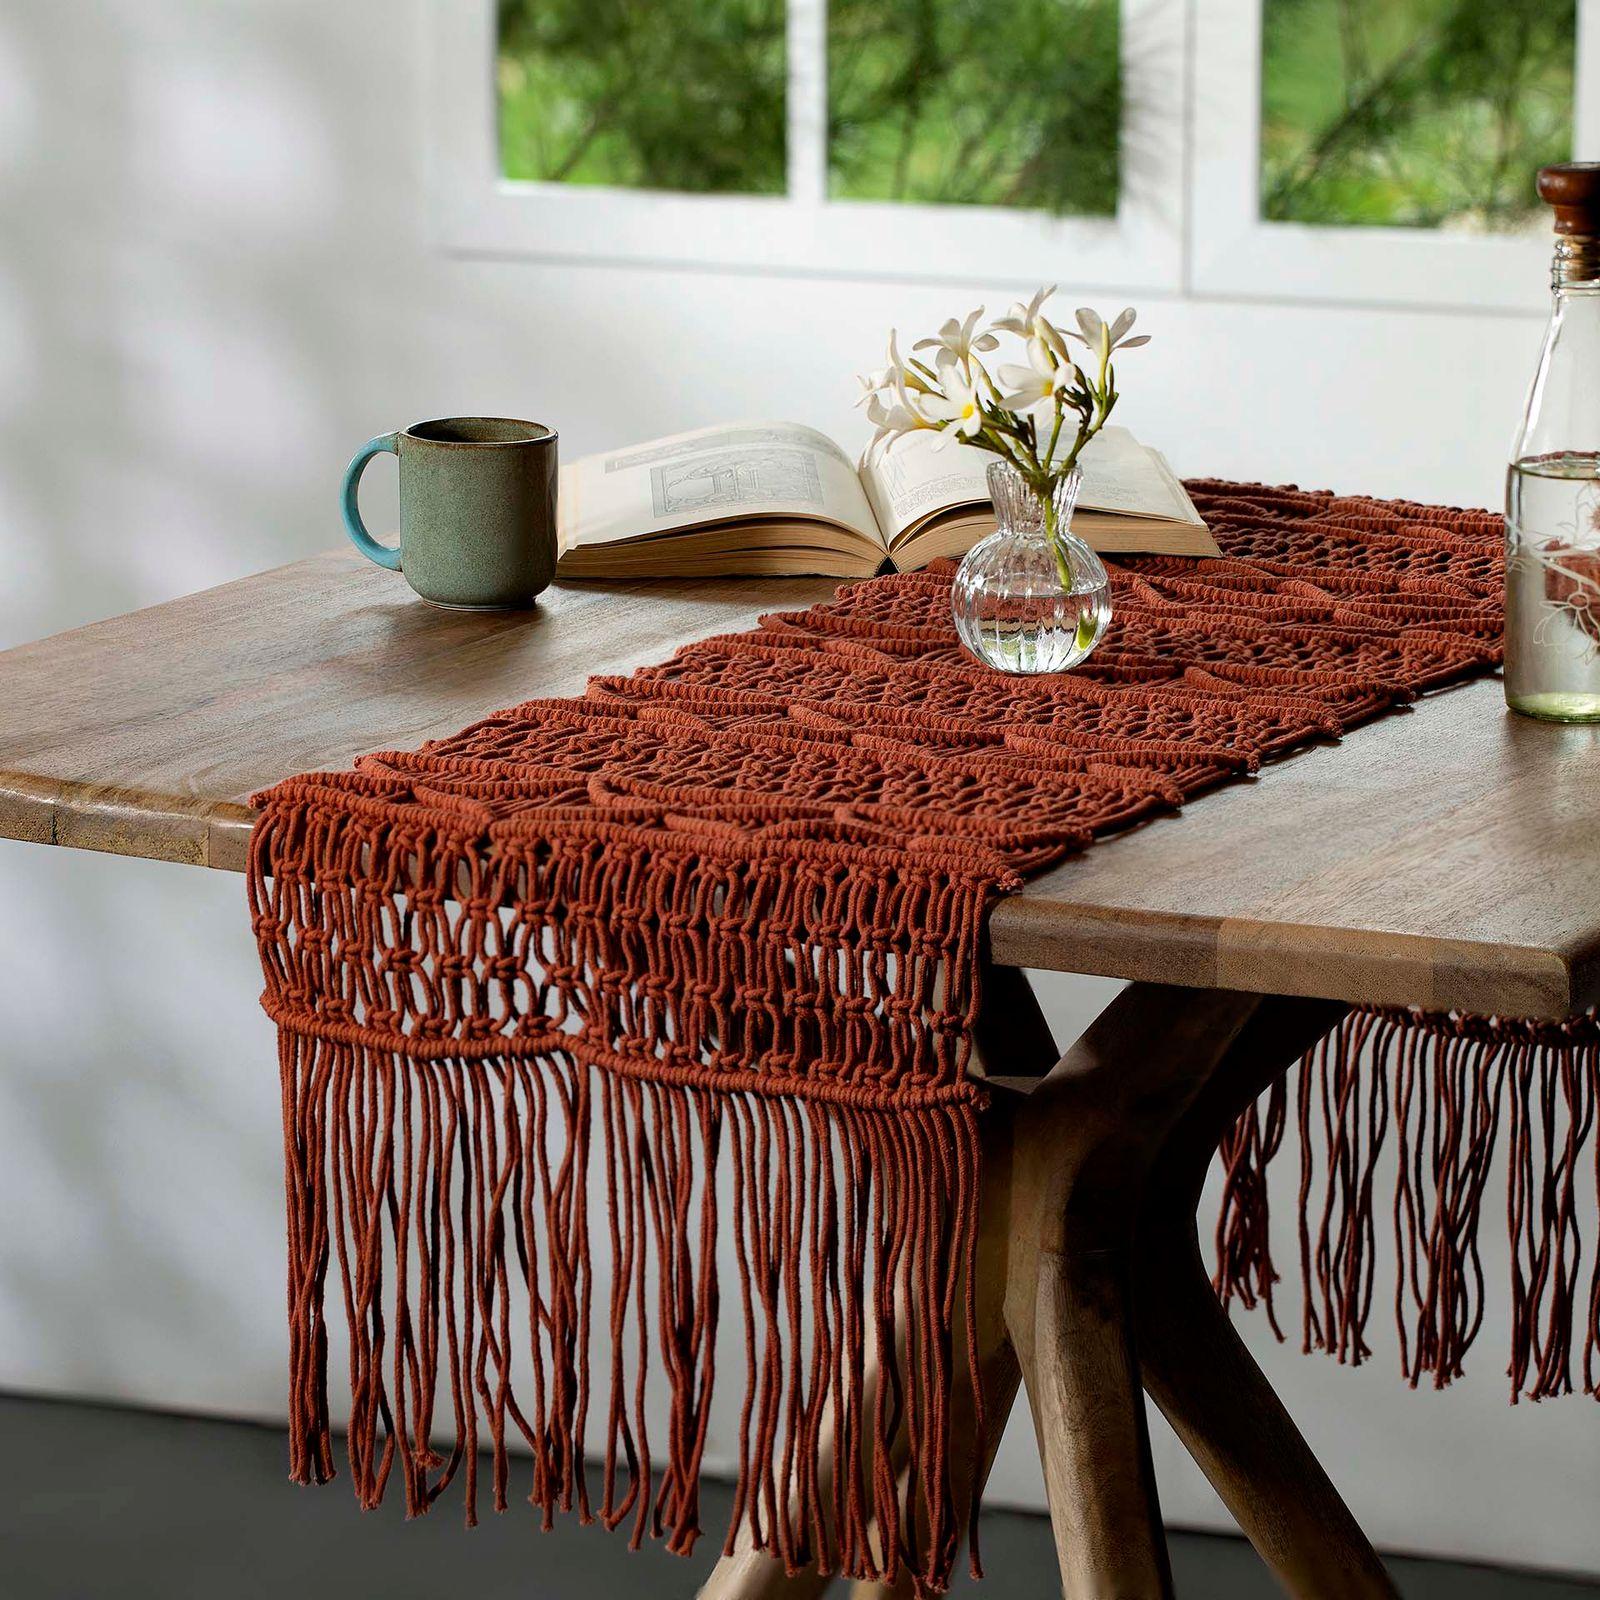 Handmade Cotton Terracotta-Colored Macramé Table Runner